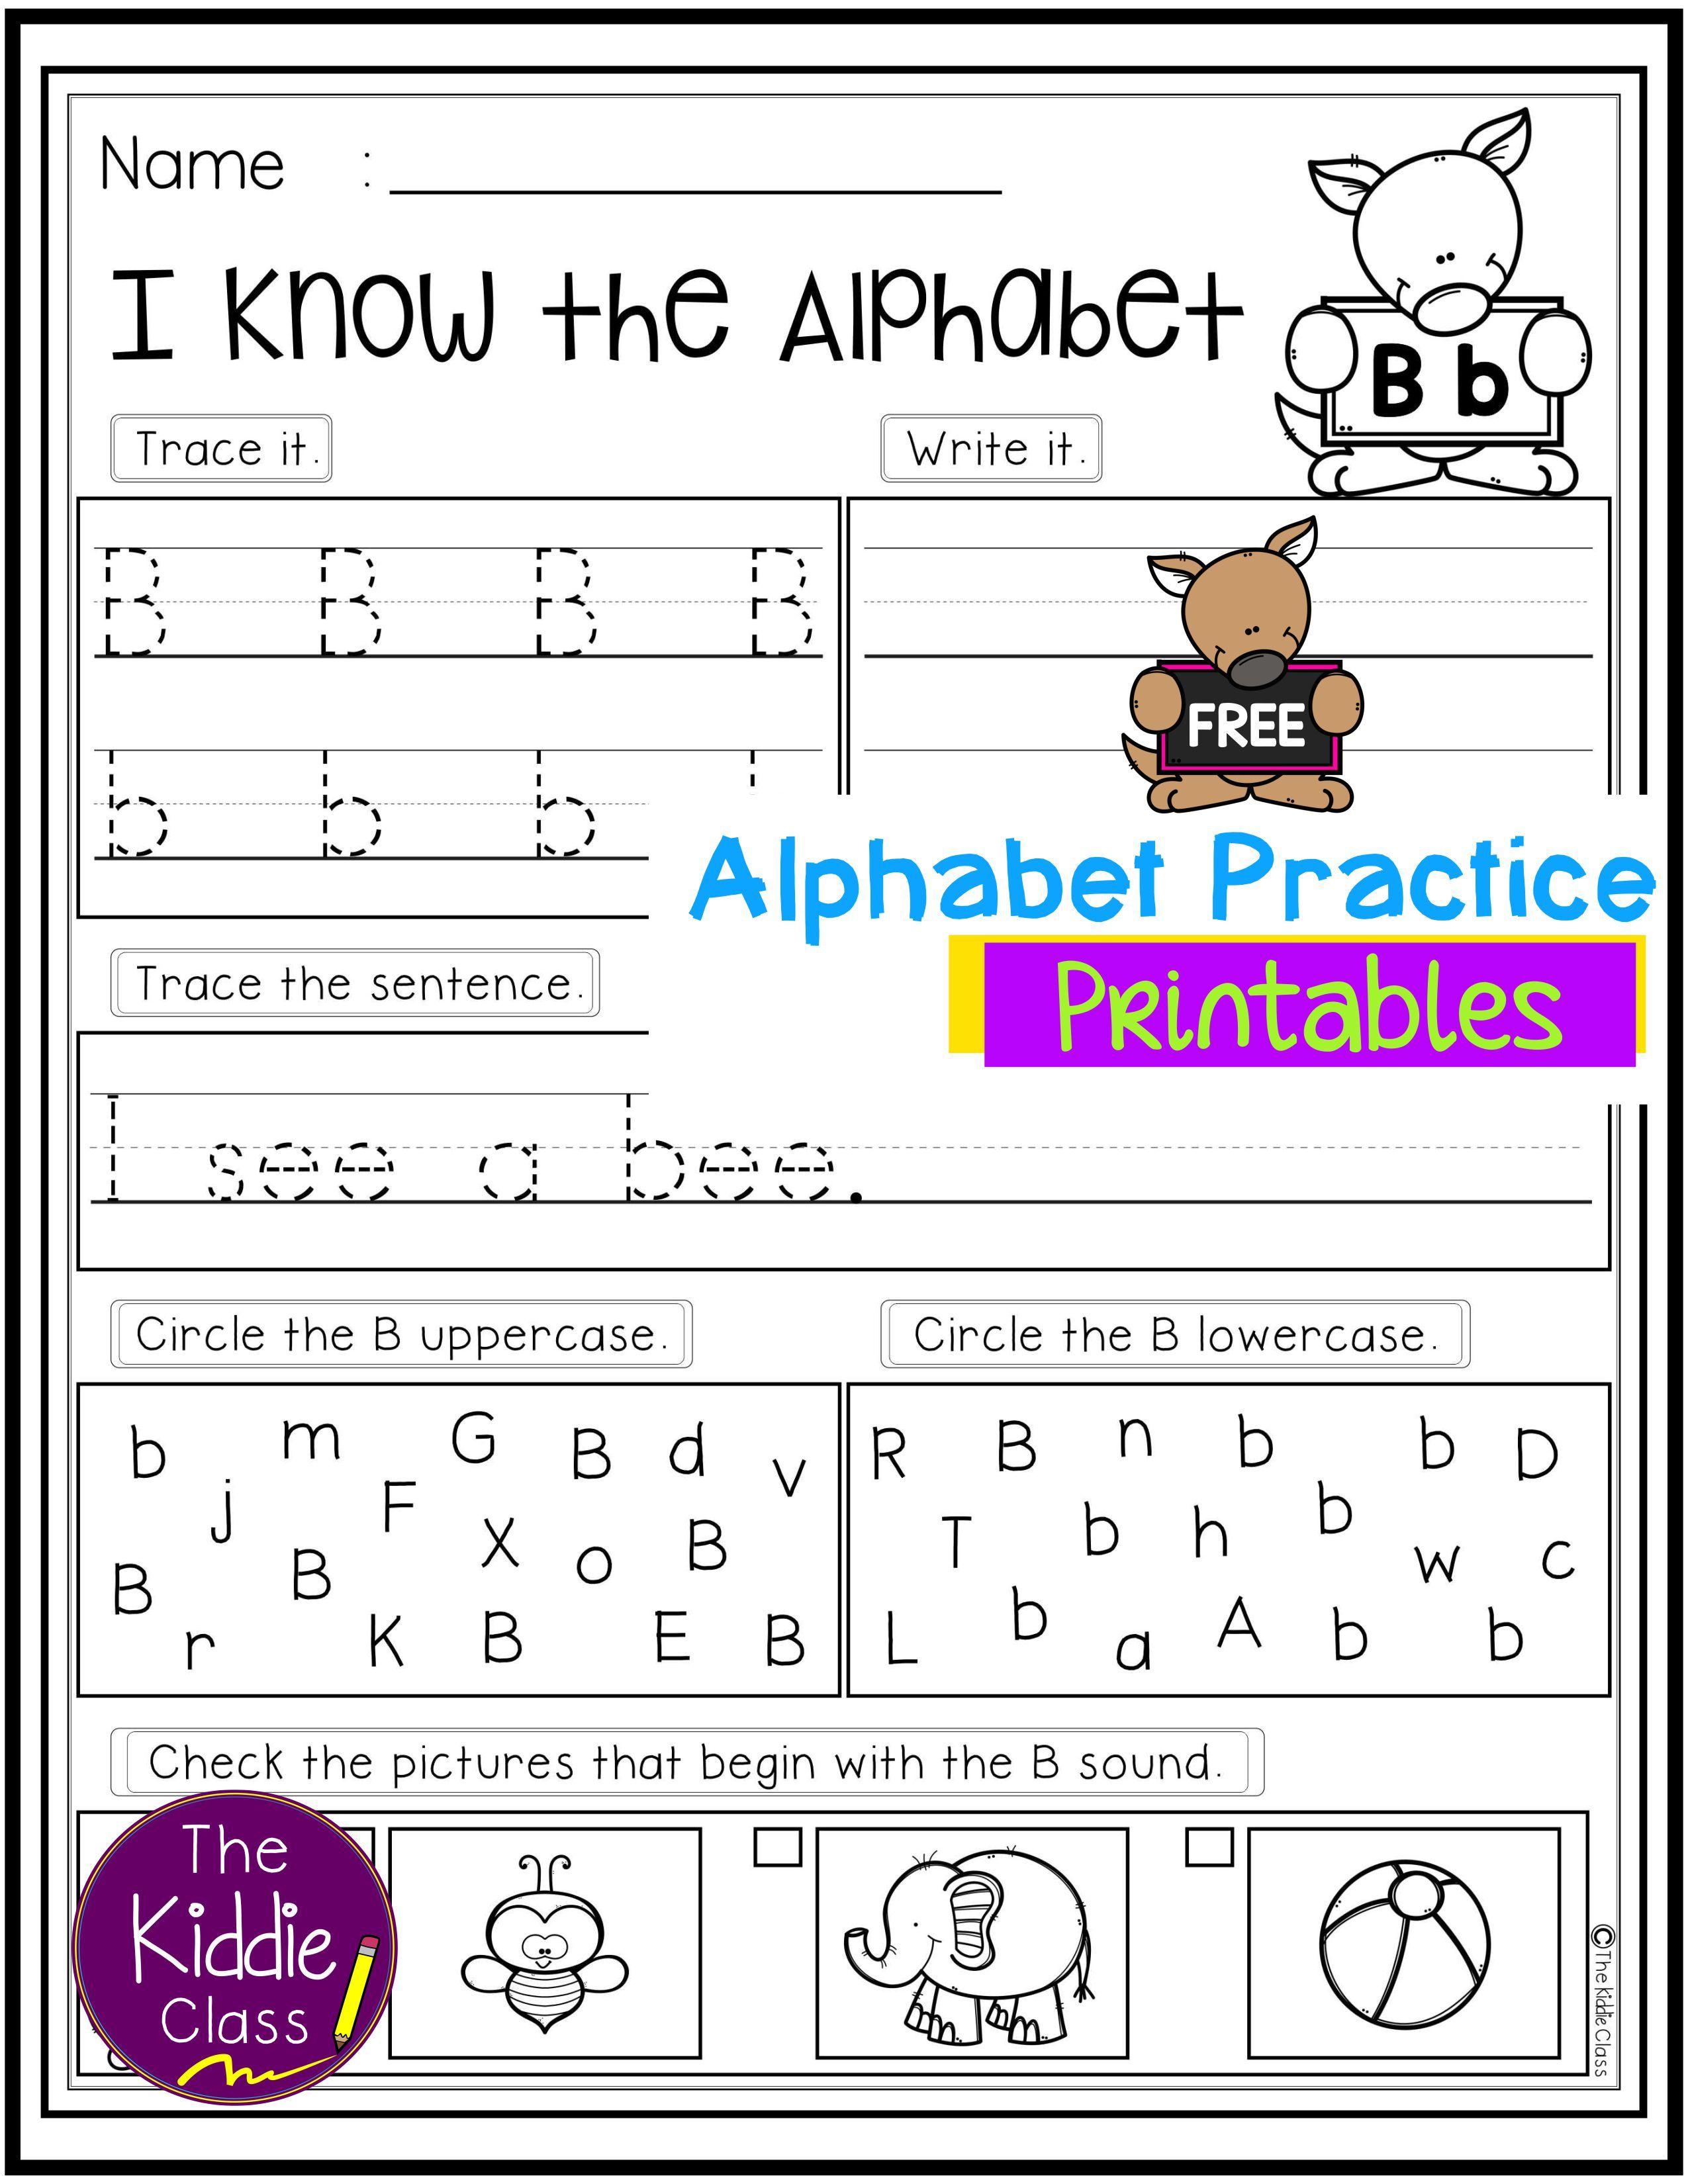 Free Alphabet Practice Printables In